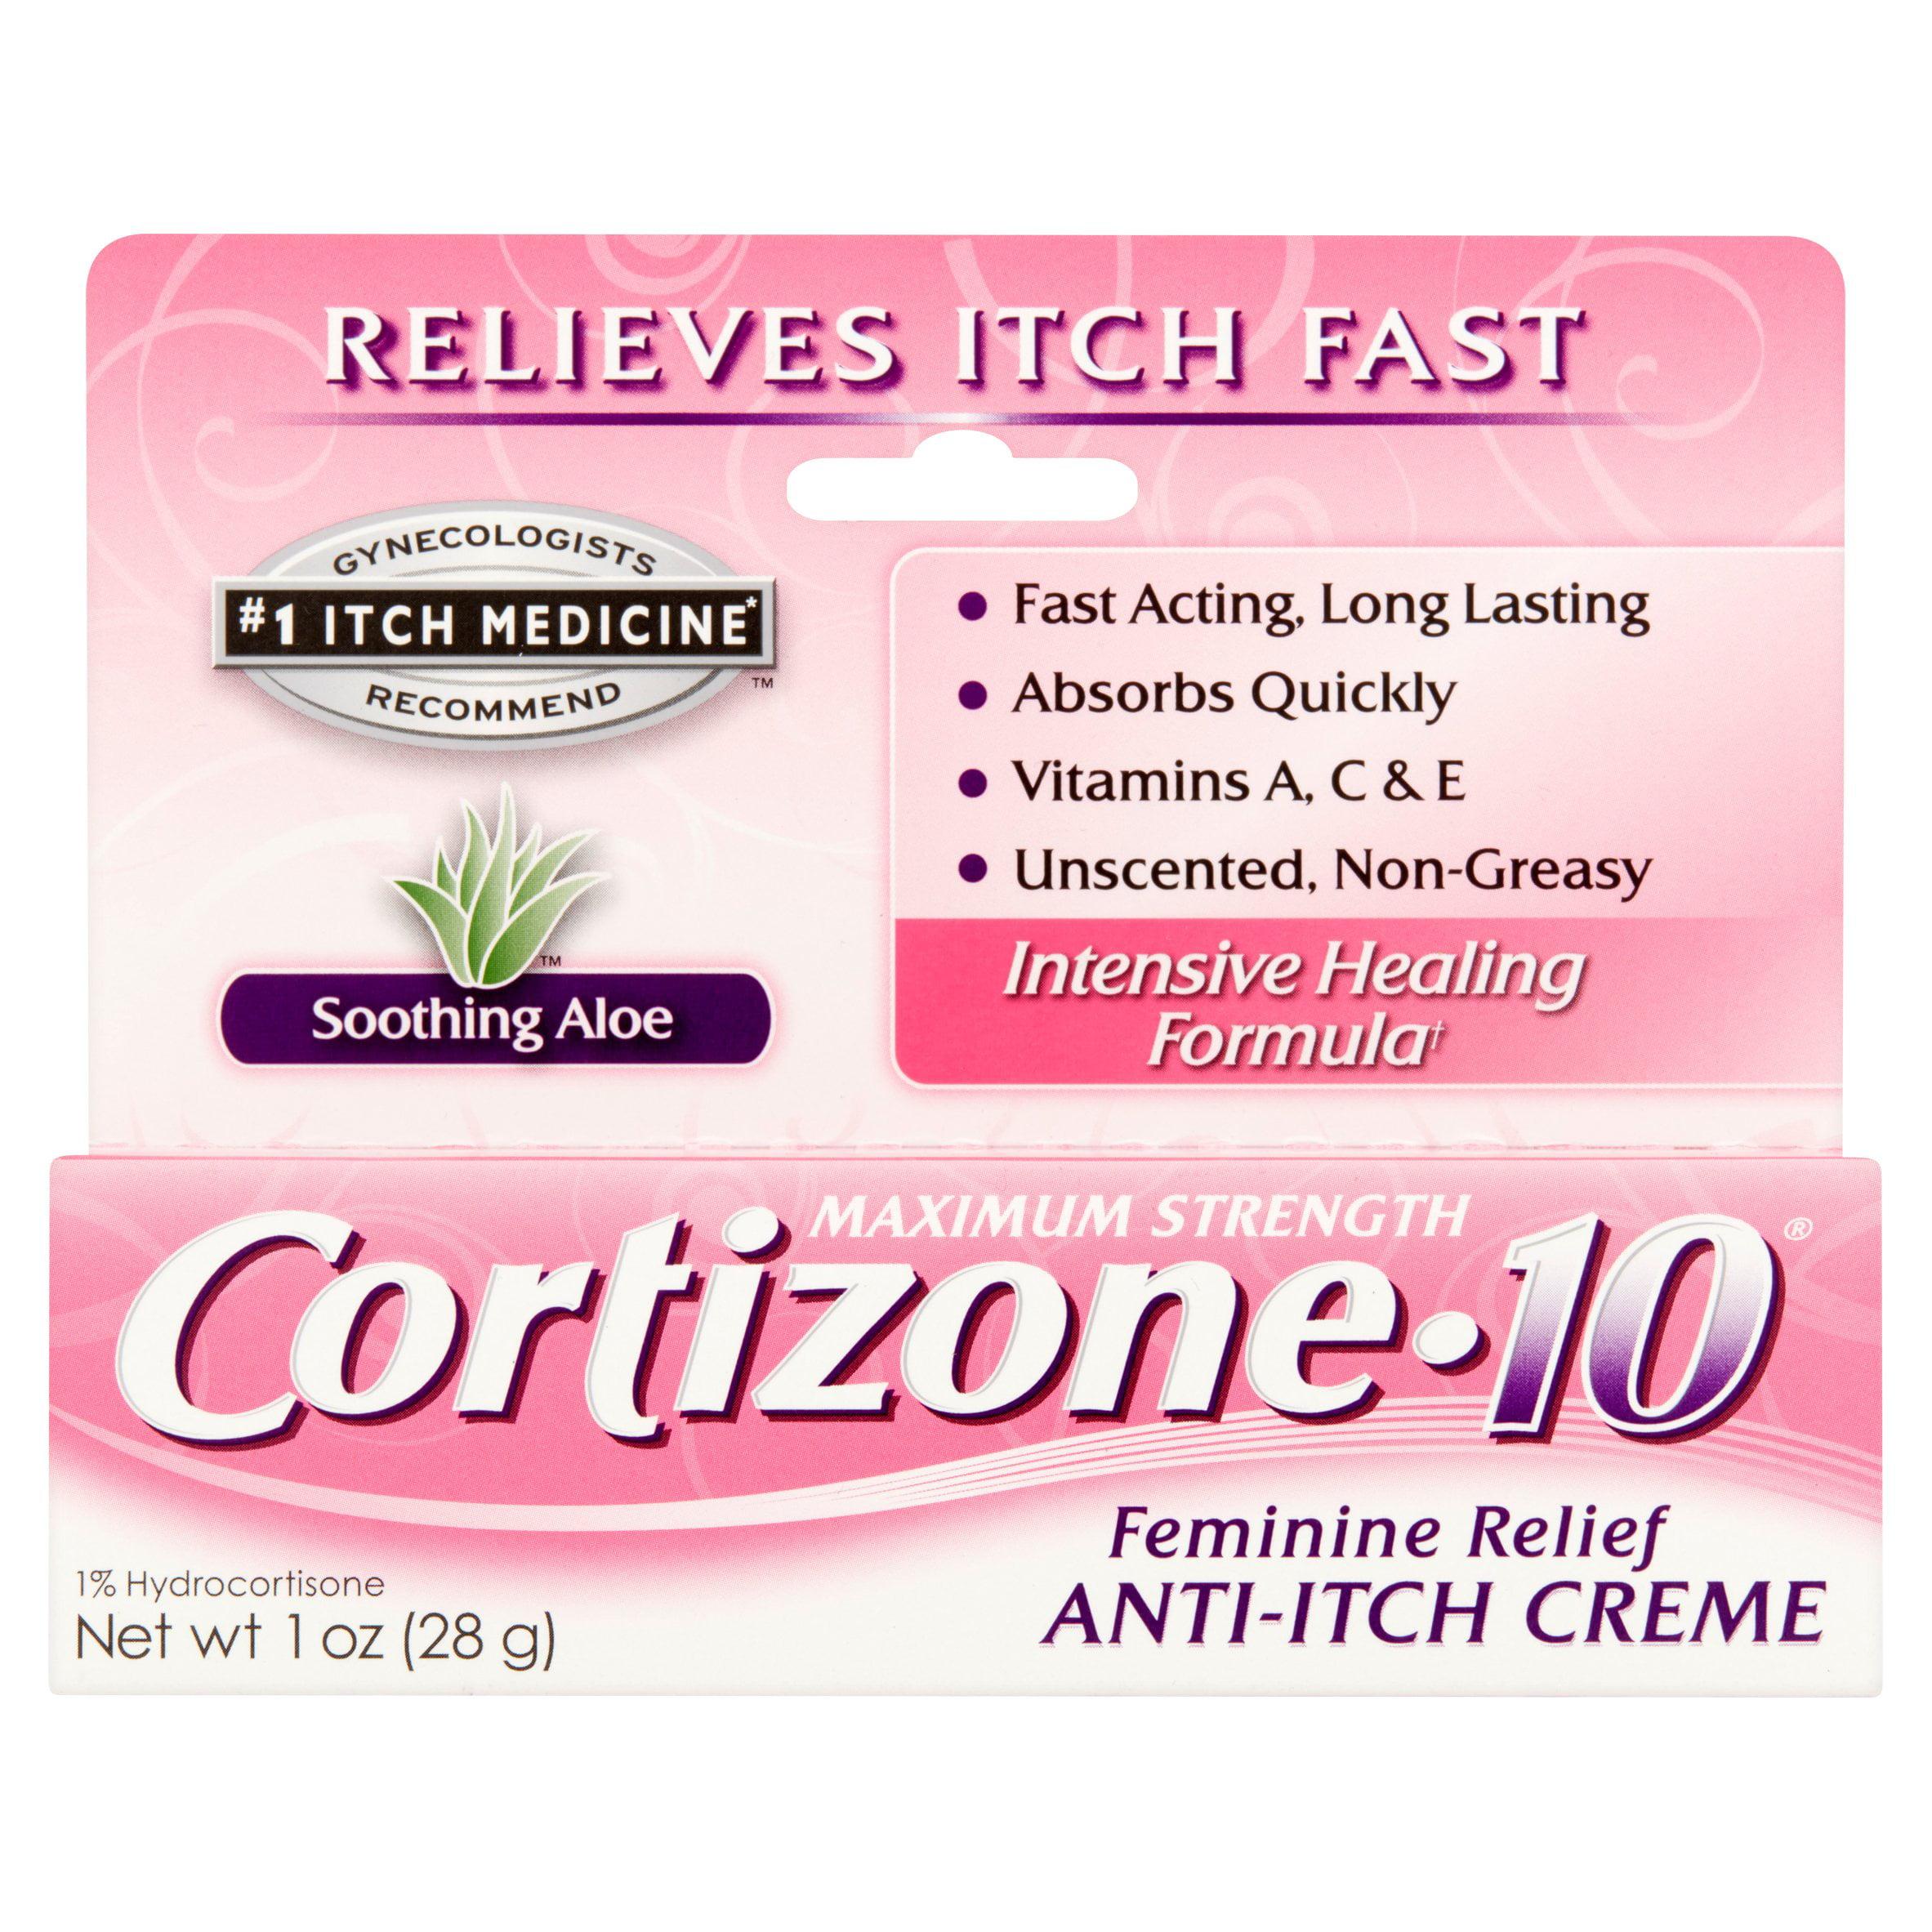 Cortizone 10 Maximum Strength Feminine Relief 1% Hydrocortisone Anti-Itch Crème, 1oz